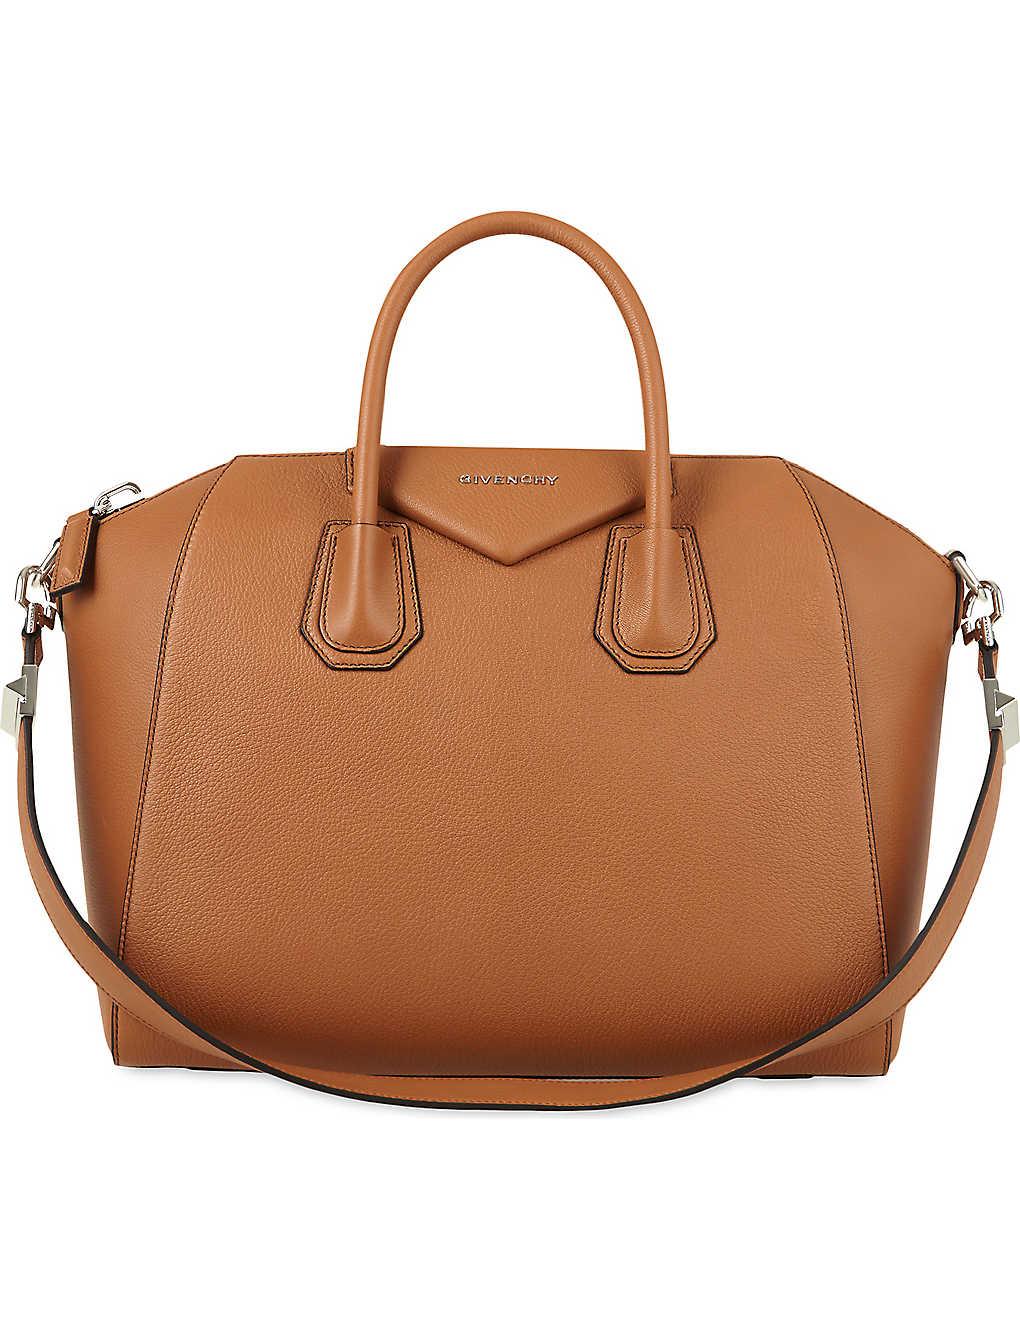 18d760e627a4 GIVENCHY - Antigona Sugar medium leather tote